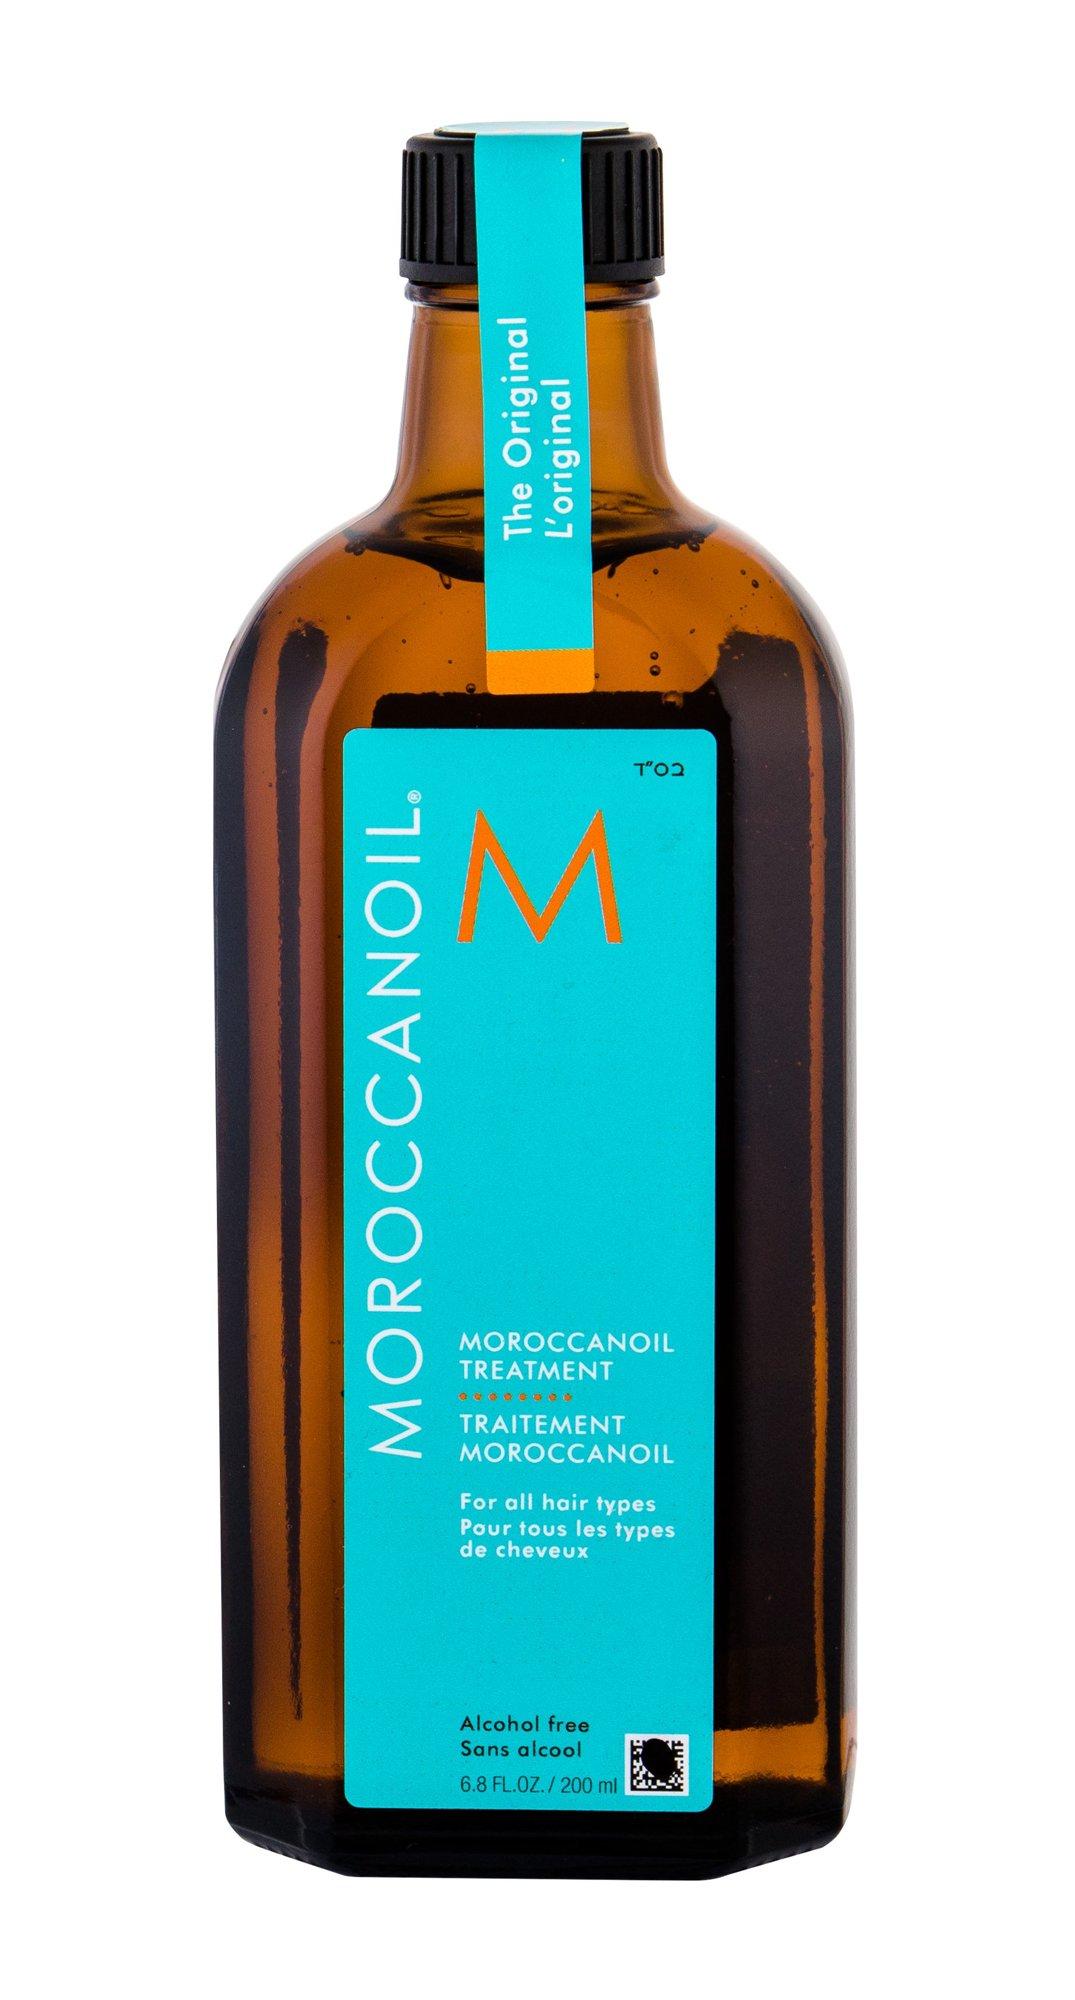 Moroccanoil Treatment Hair Oils and Serum 200ml